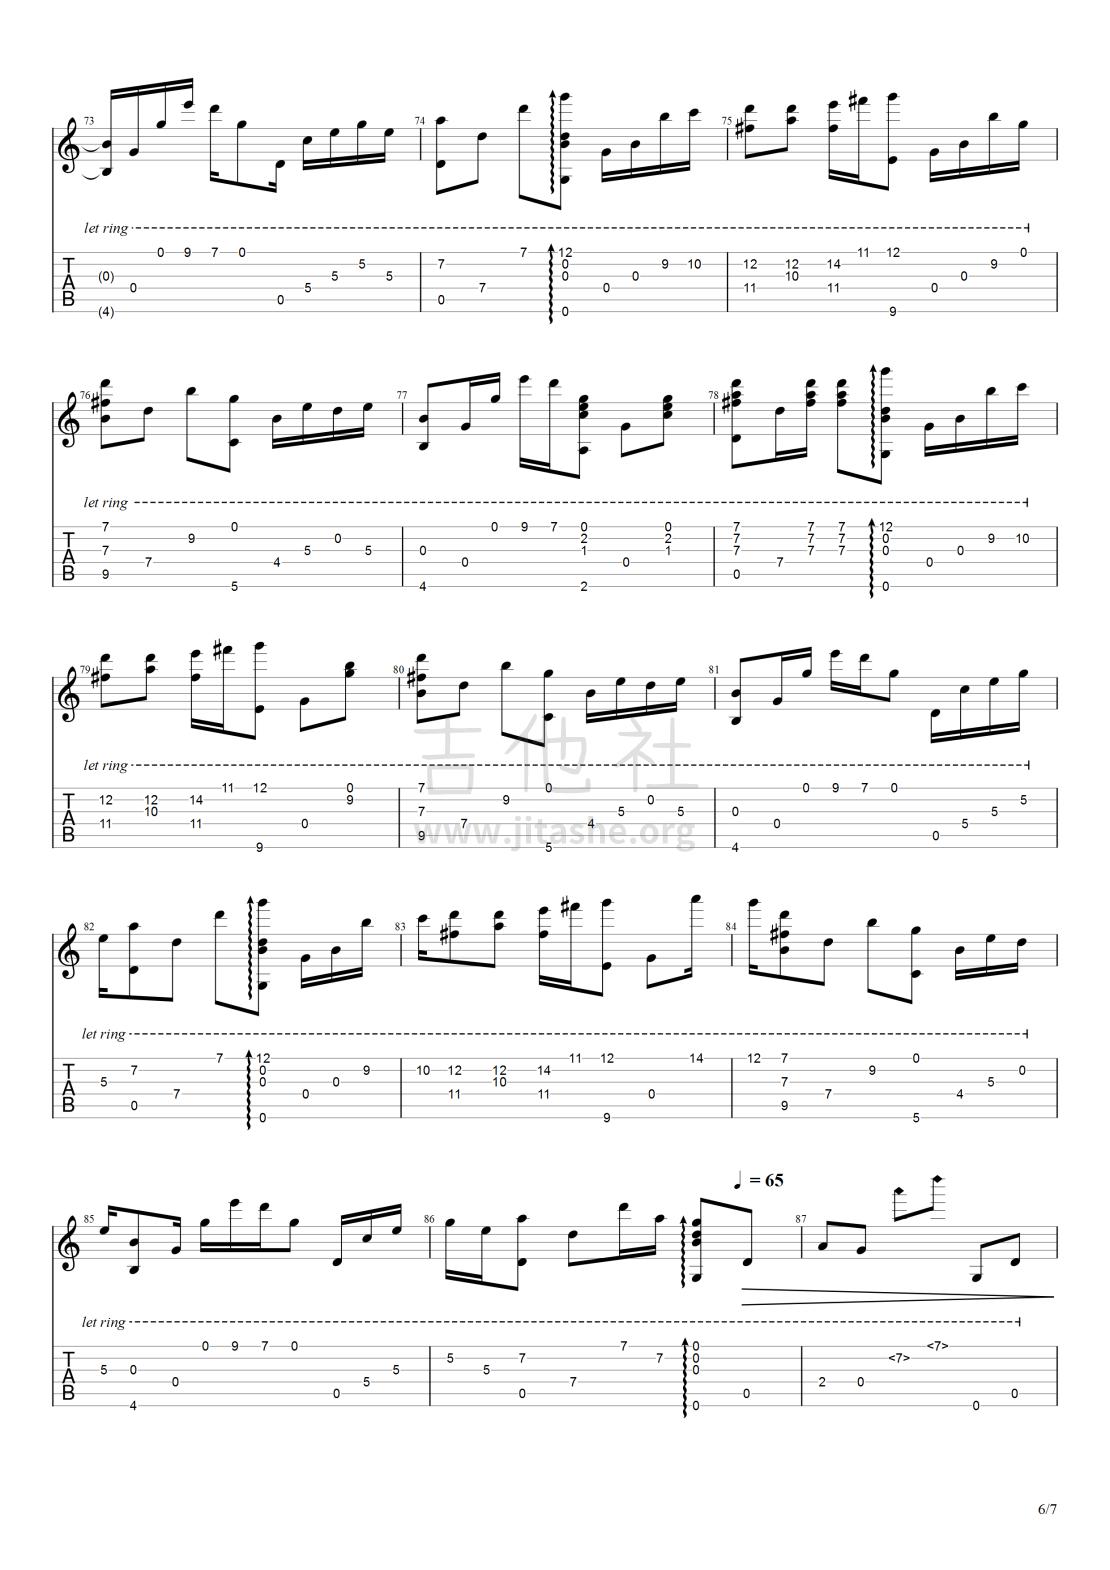 Snow Light吉他谱(图片谱,指弹)_奏帆(Kanaho)_snow light#6.png